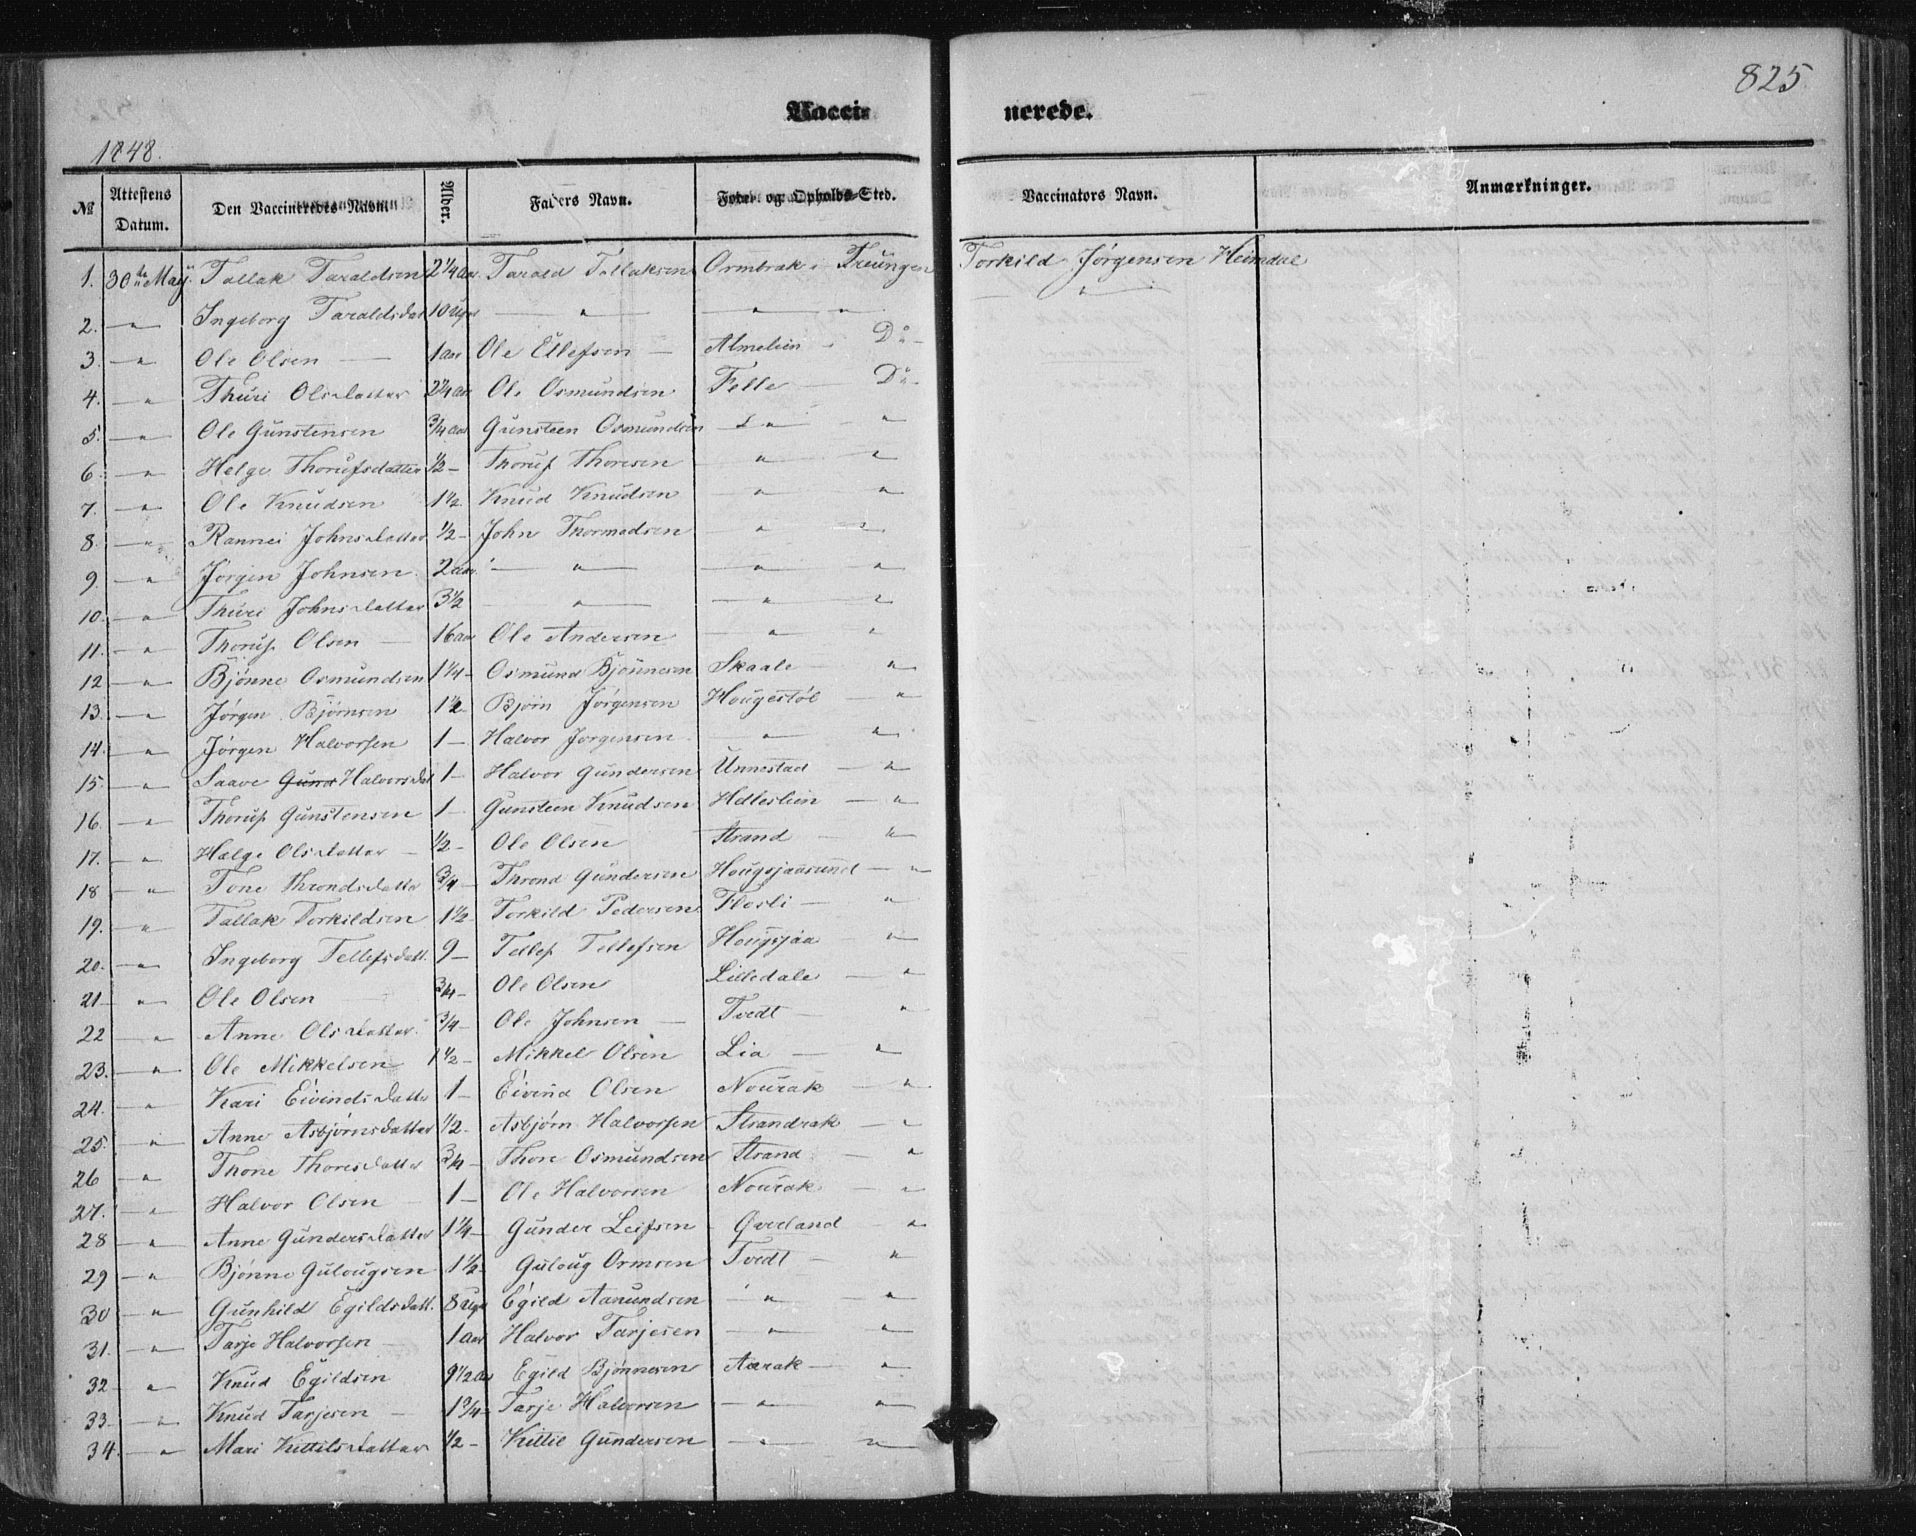 SAKO, Nissedal kirkebøker, F/Fa/L0003: Ministerialbok nr. I 3, 1846-1870, s. 824-825